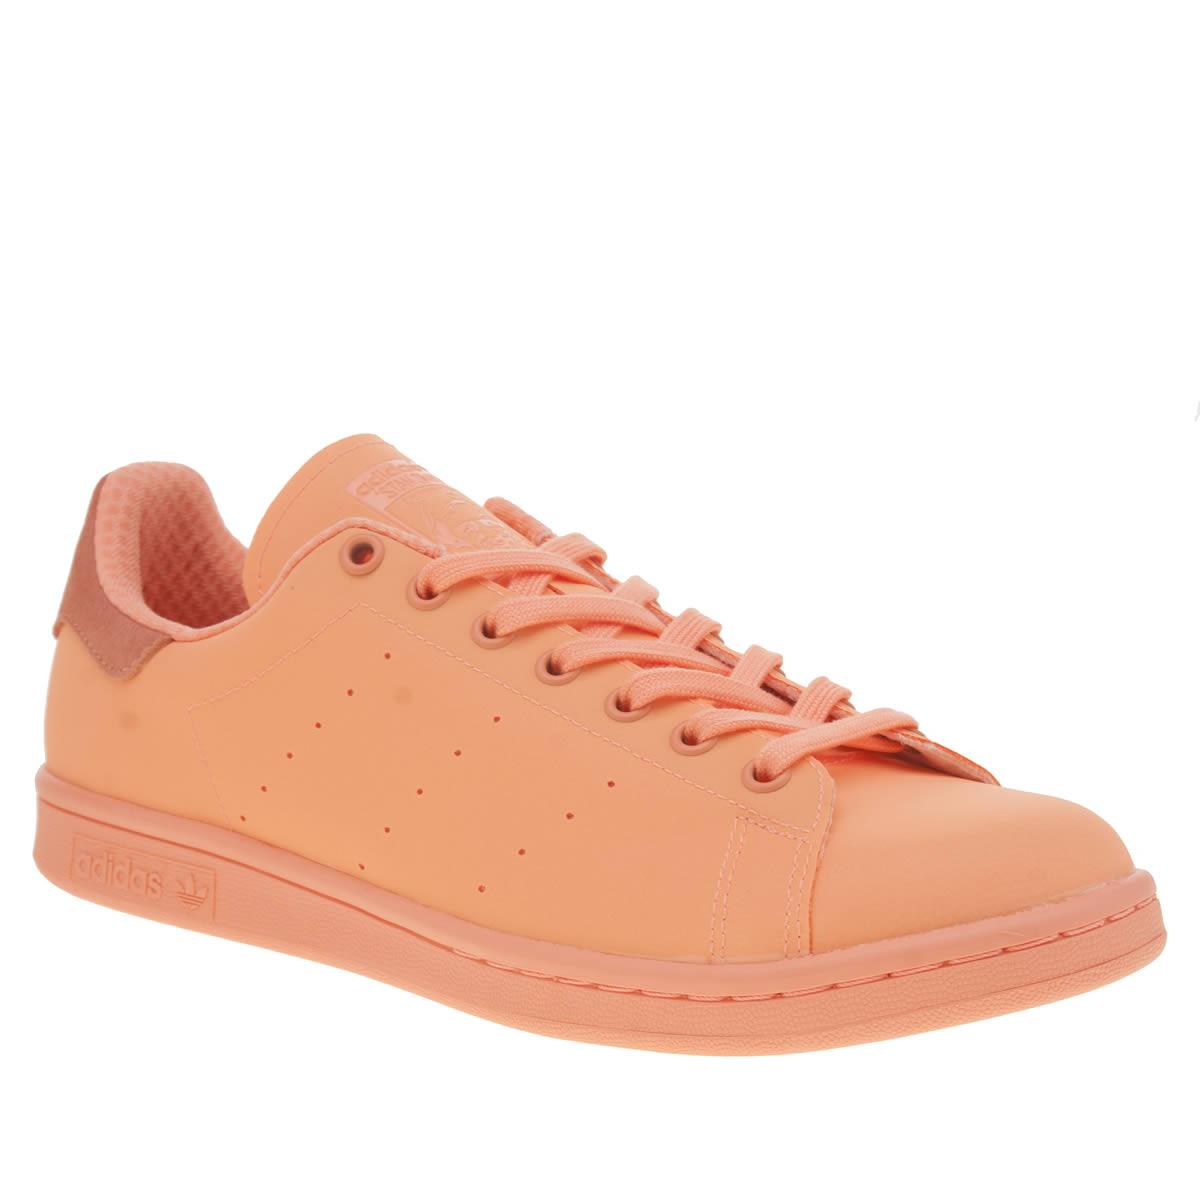 adidas originals stan smith 2 mens Orange